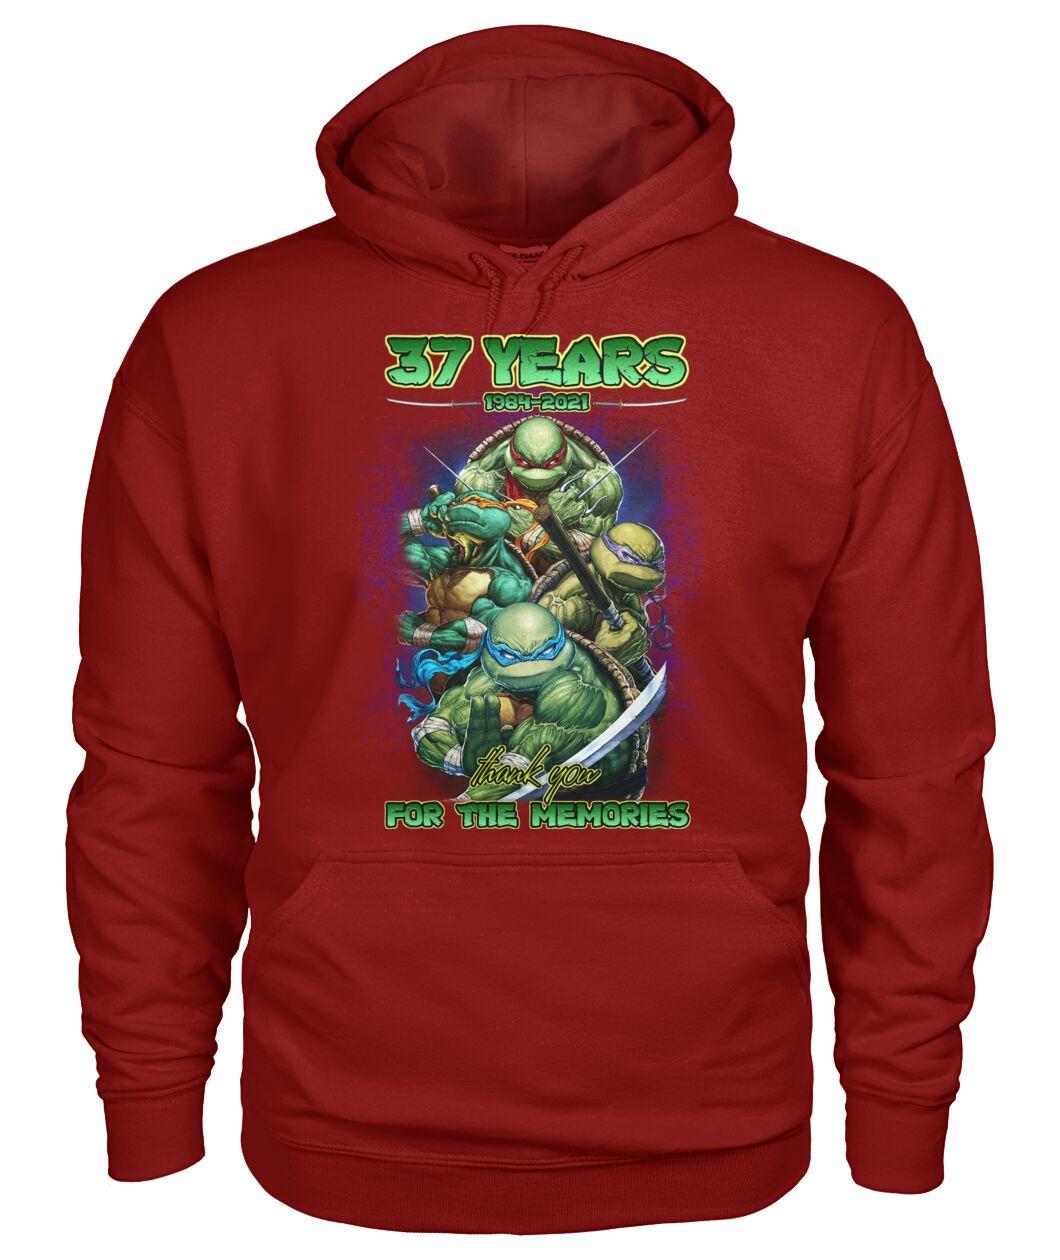 Ninja turtles 37 years 1984 2021 for the memories Shirt 19